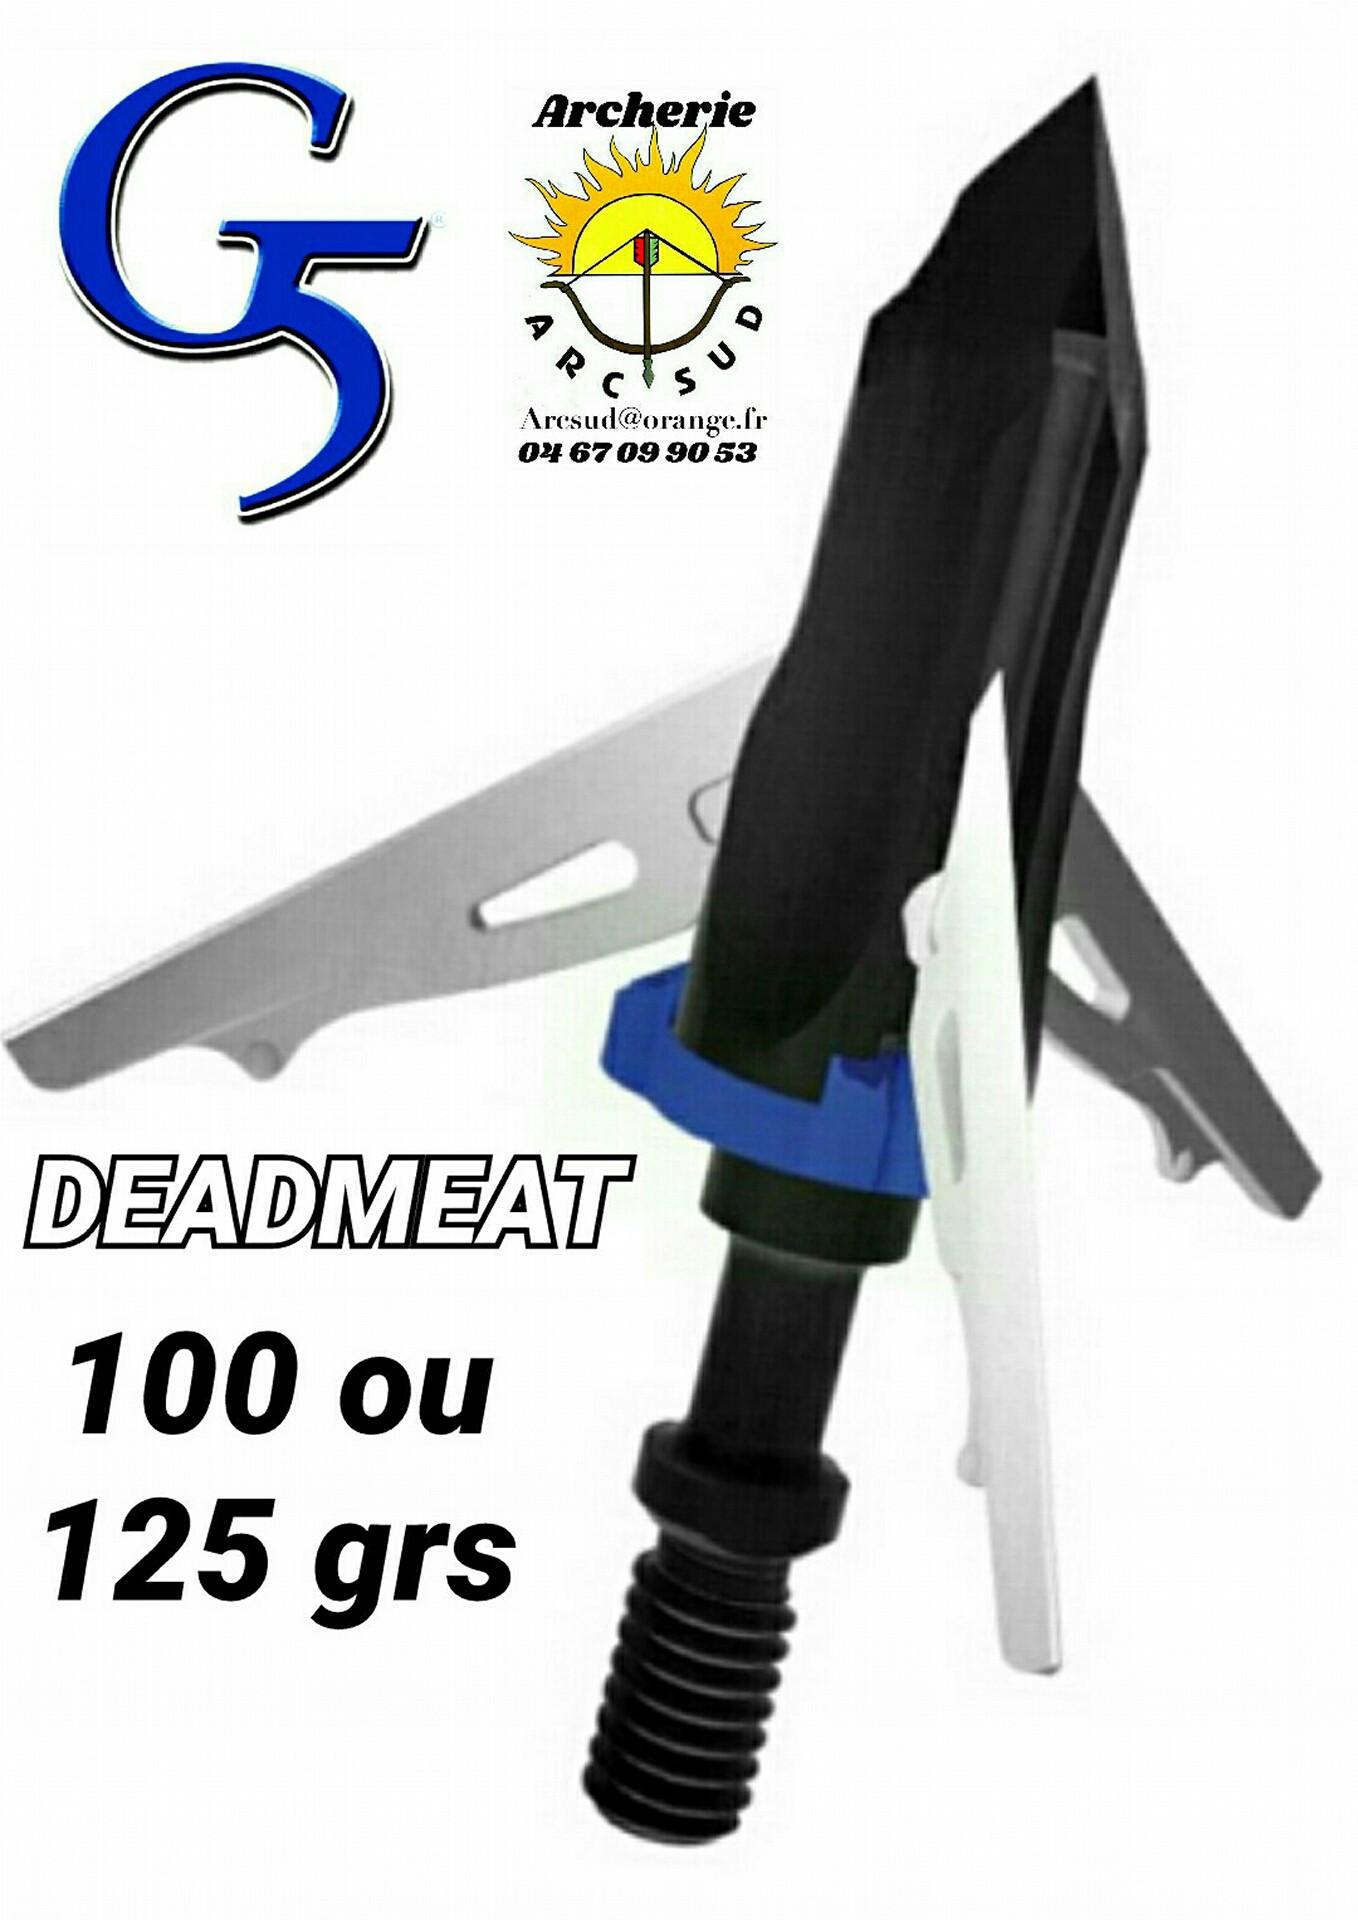 G5 DEADMEAT//viande morte de Rechange Lame Kit 100/% Grade A En Acier 860